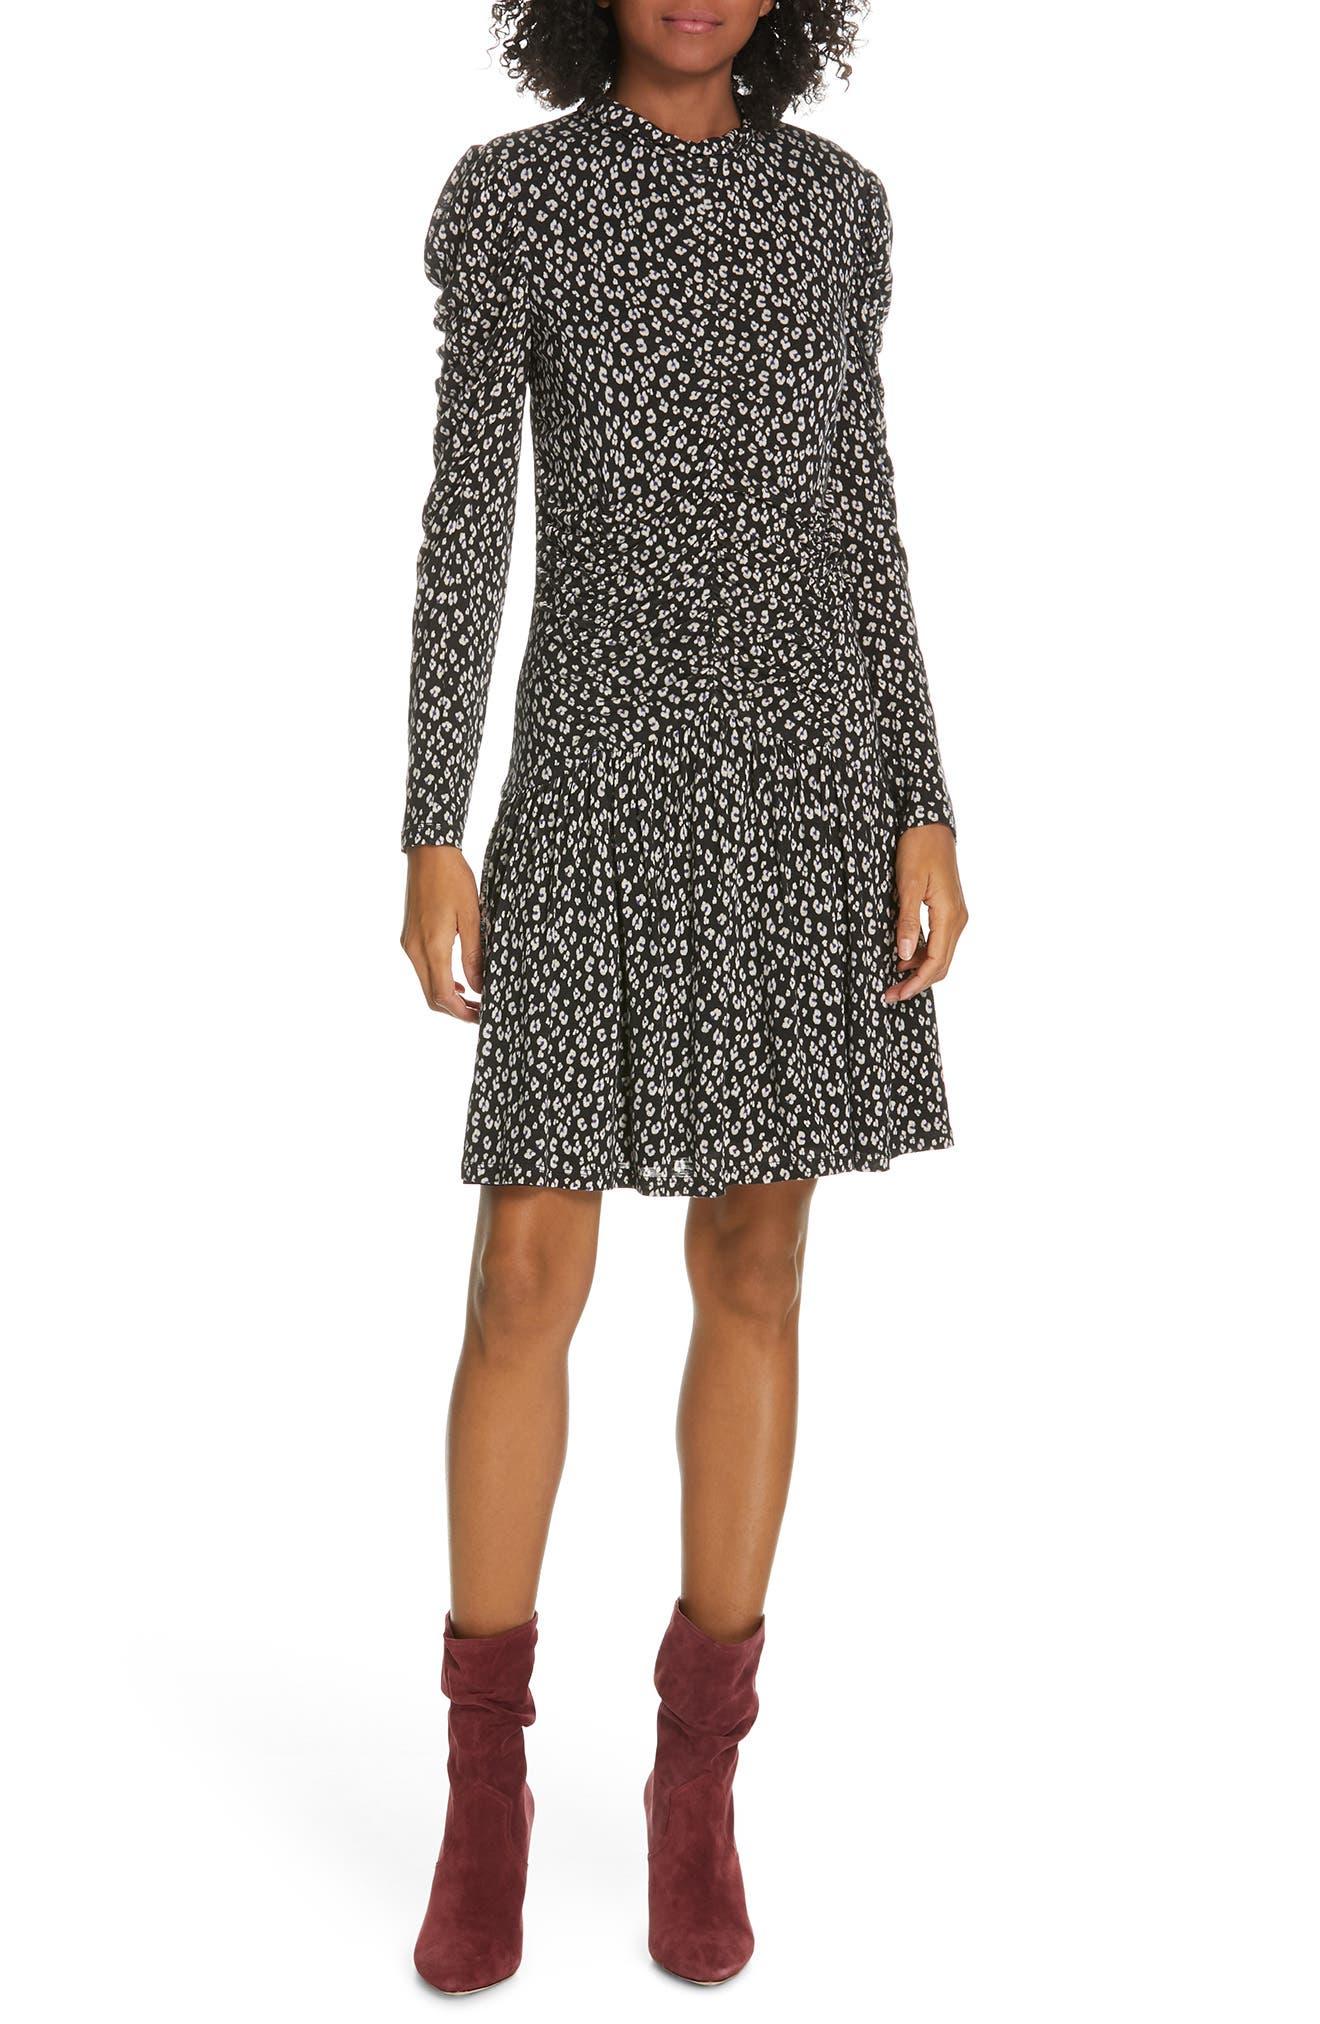 REBECCA TAYLOR Cheetah Ruched Jersey Dress, Main, color, 014